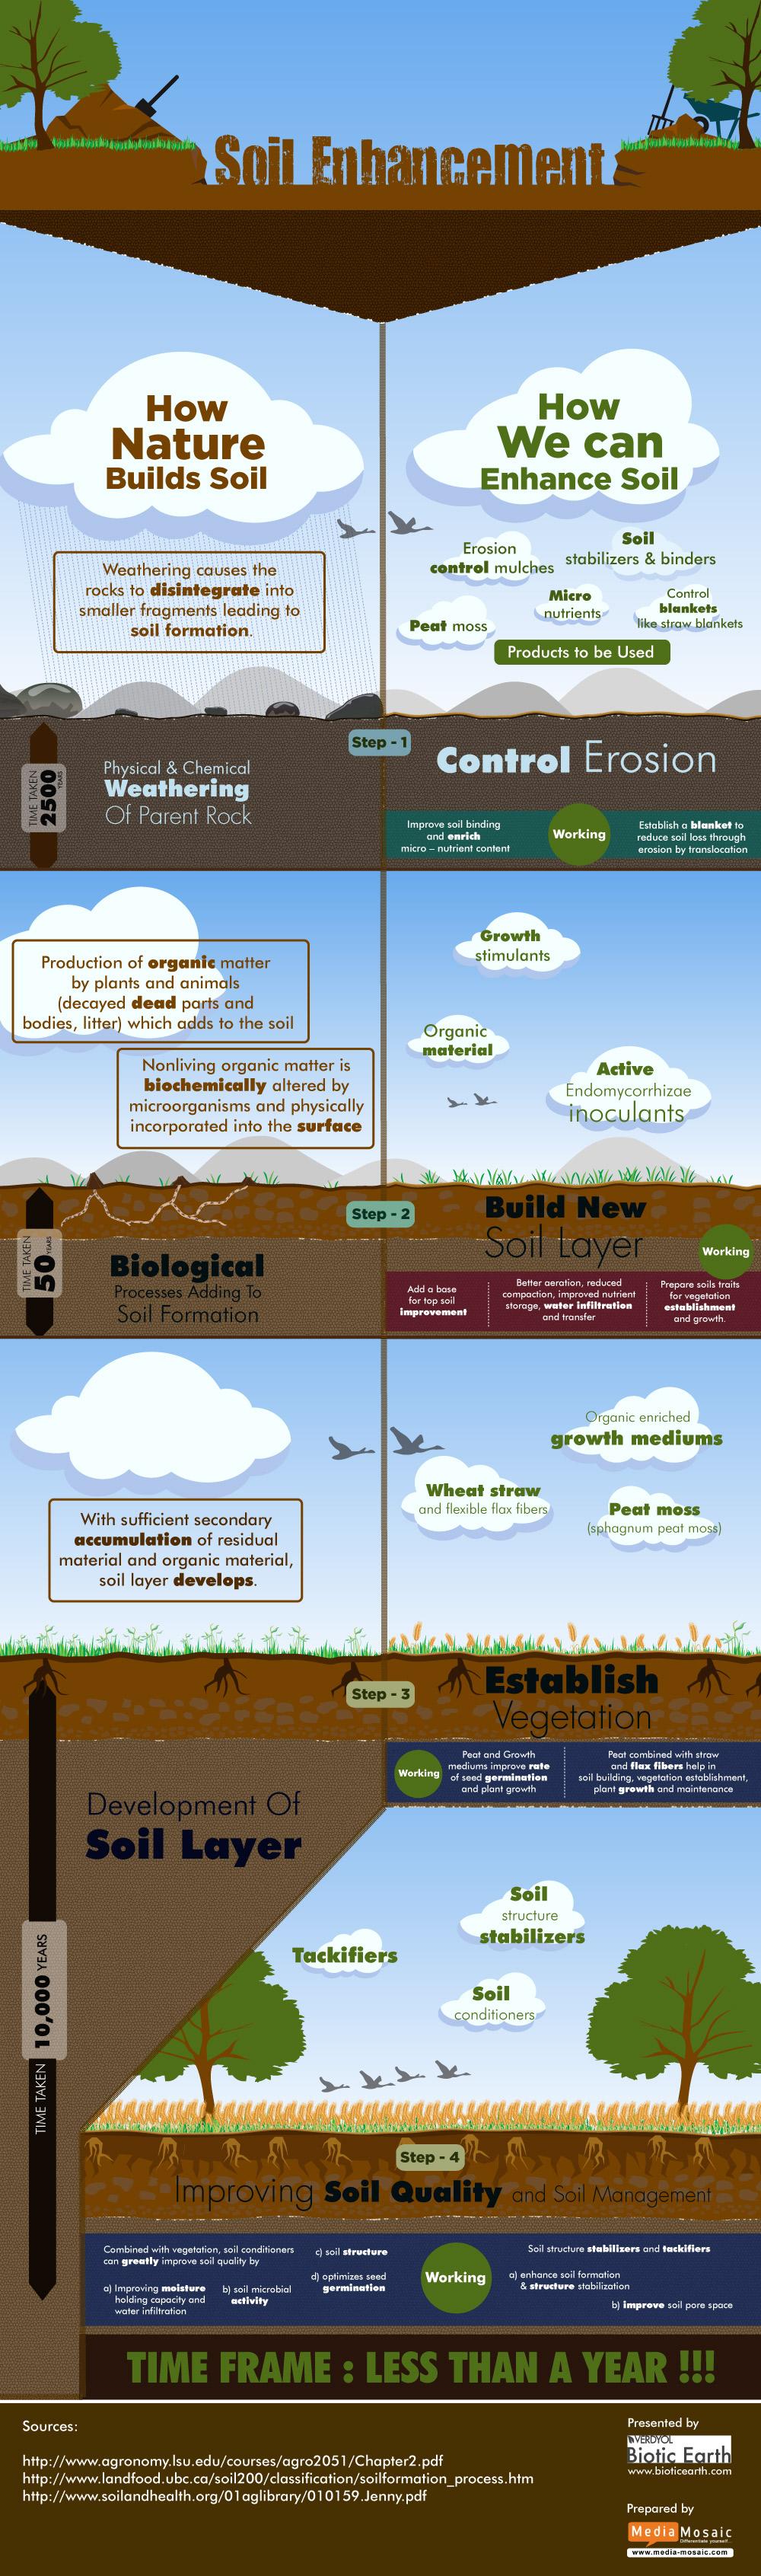 infogrpaphic-soil-enhancement_5264b4445ab61